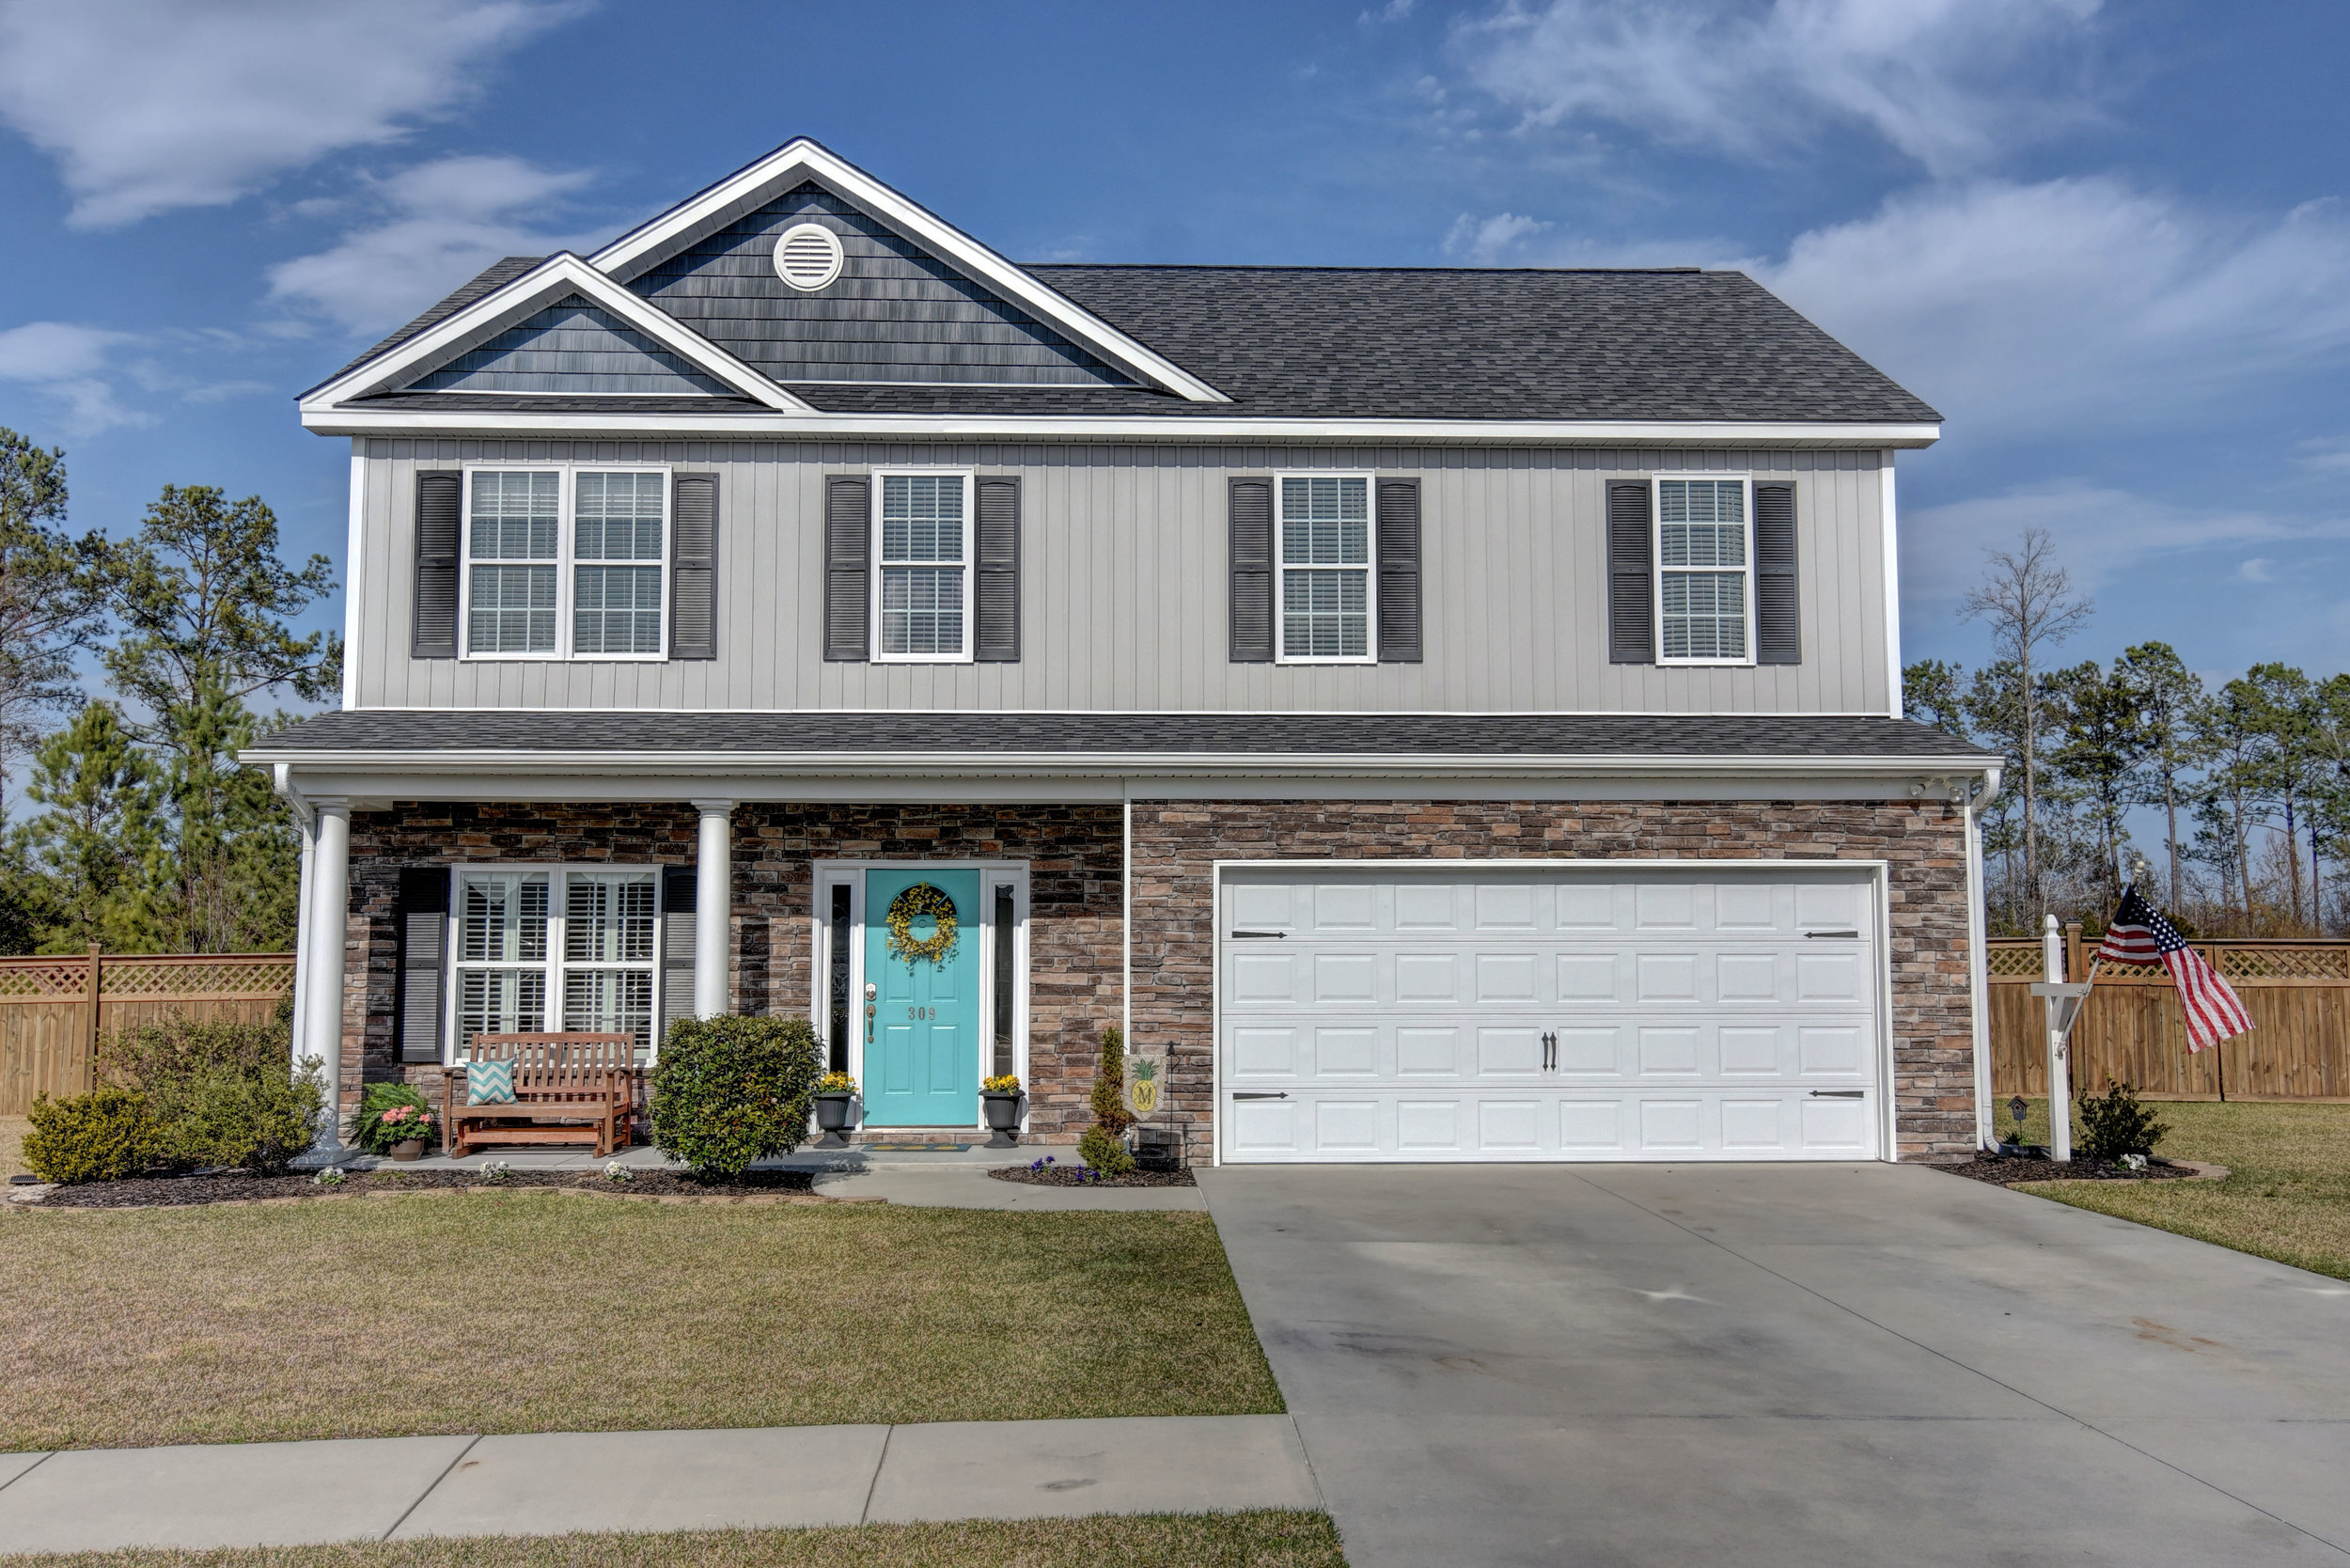 309 Onyx Ct Jacksonville NC-print-001-1-DSC 1451 2 3-4200x2803-300dpi.jpg